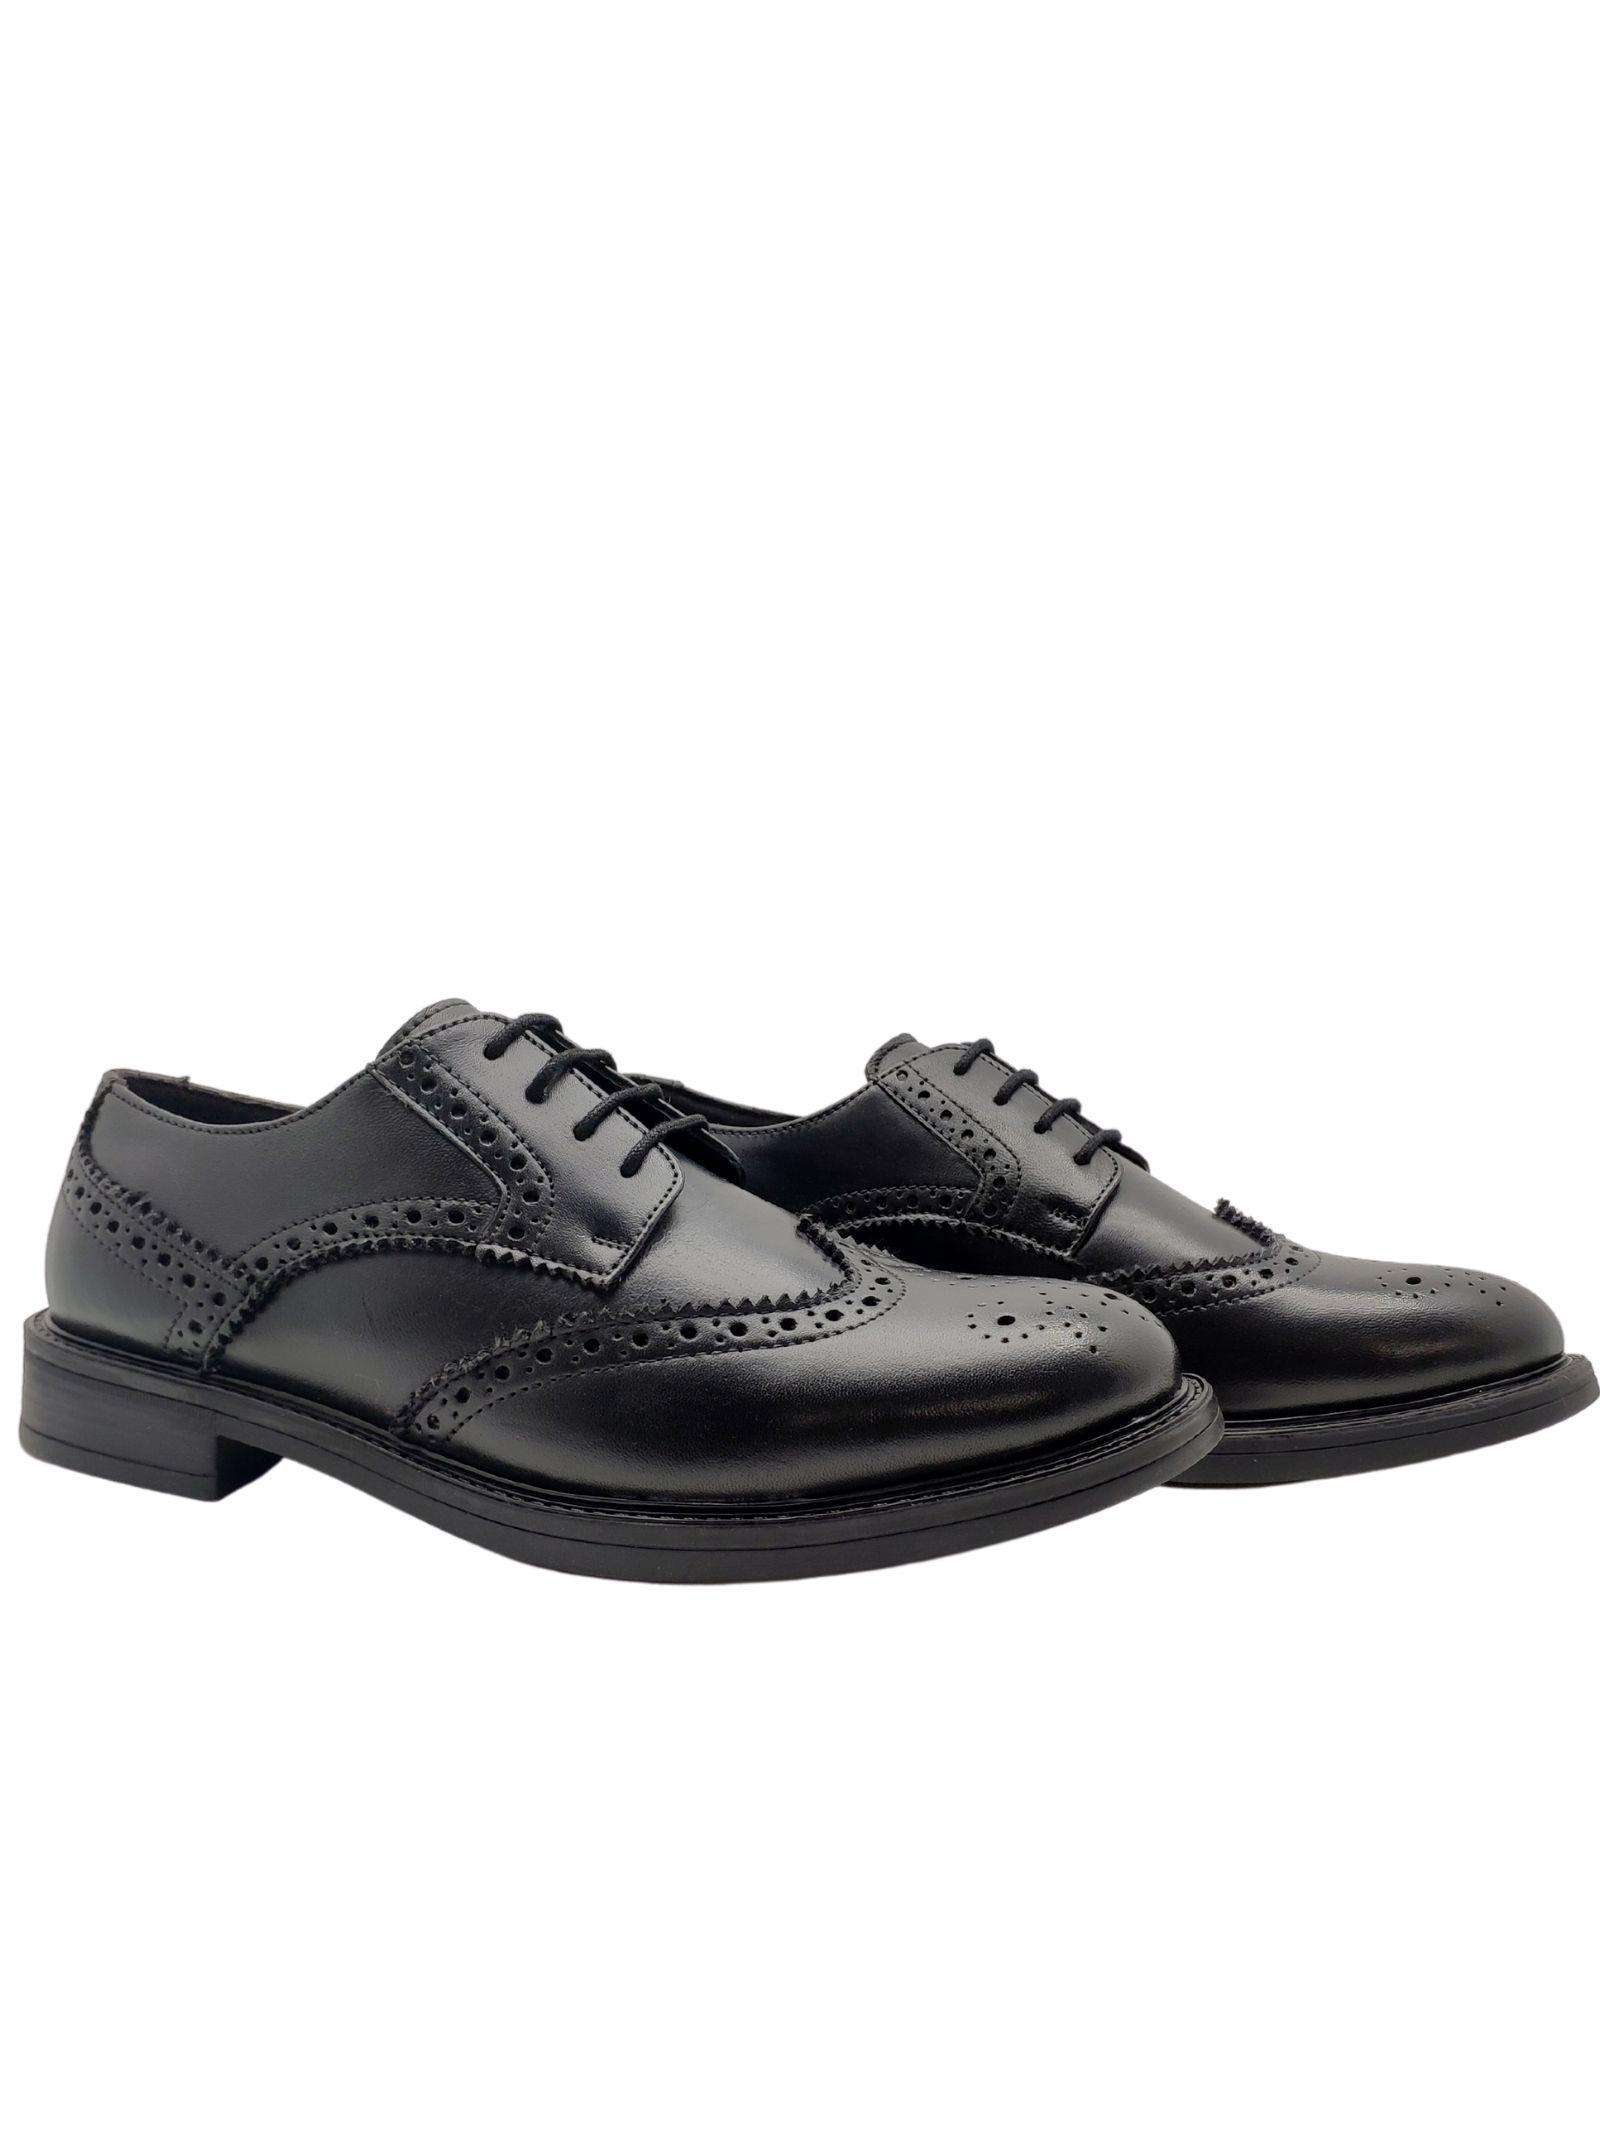 Men's Stitched Lace-ups Marina Militare | Lace up shoes | 821NERO